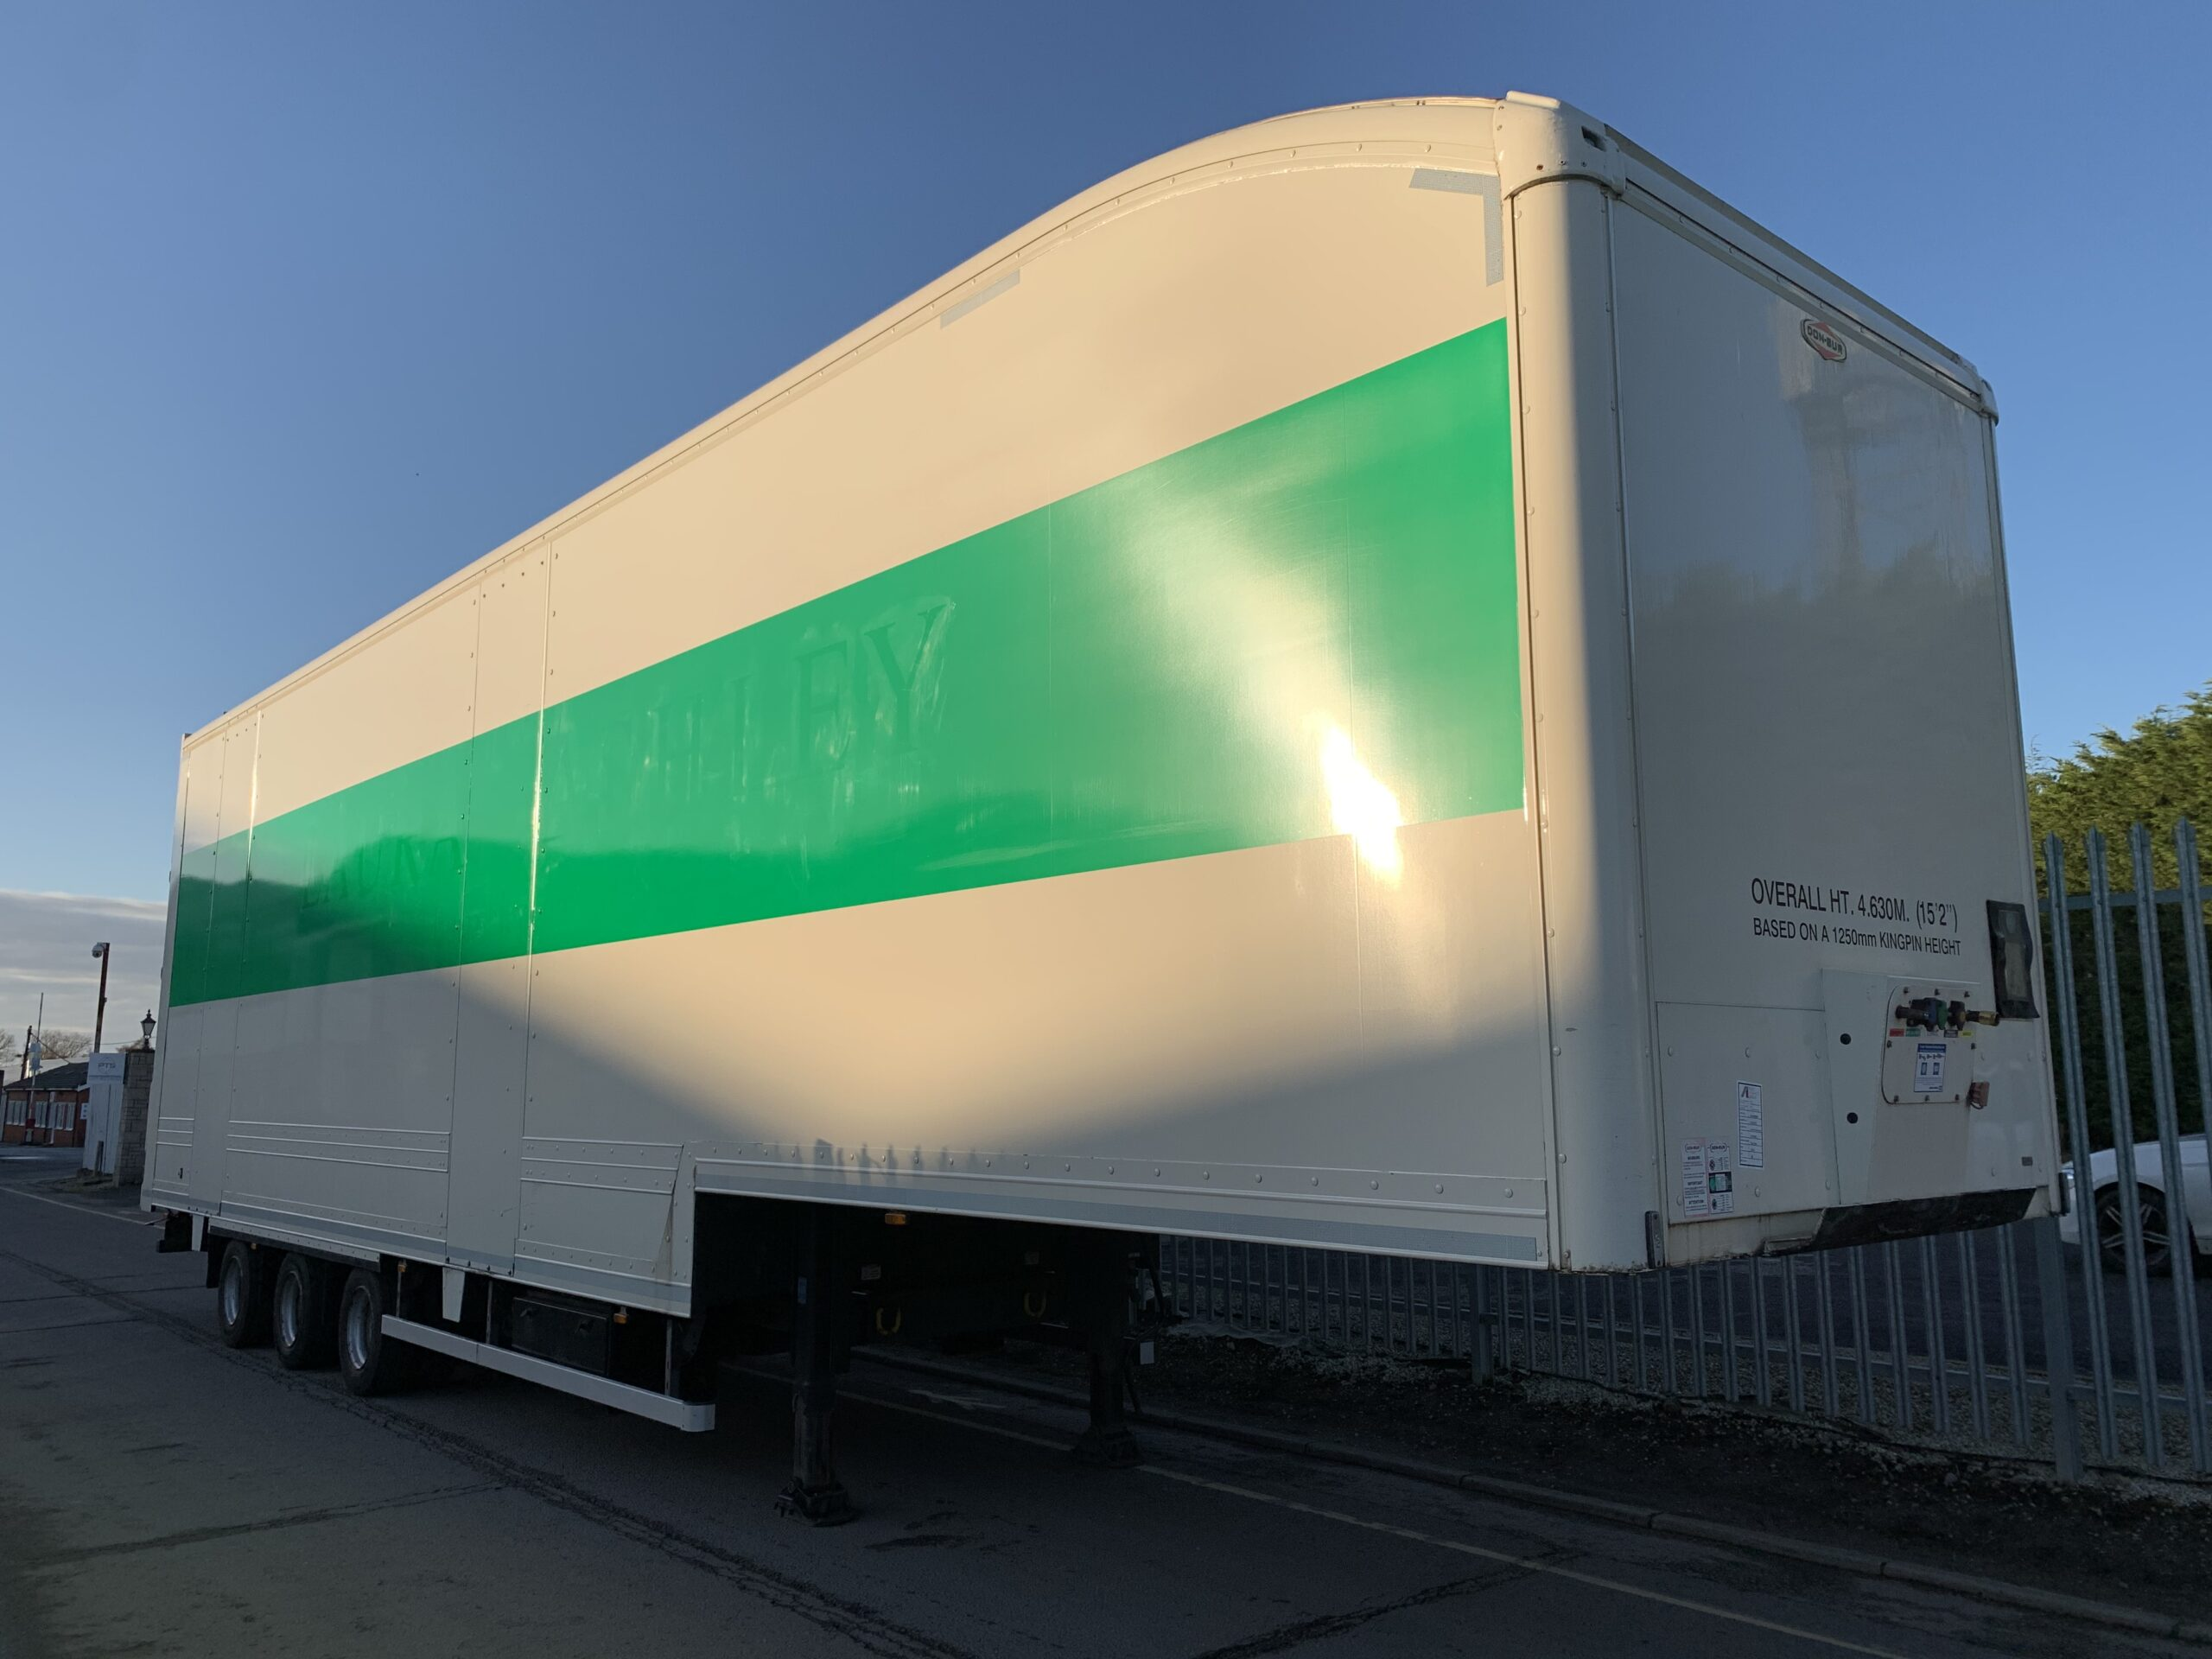 2016 Donbur Stepframe Boxvan, 4.63m External Height, BPW Axles, Drum Brakes, 17.5 Inch Wheels, Aluminium Floor, Barn Doors, Hydraulic Internal Deck.